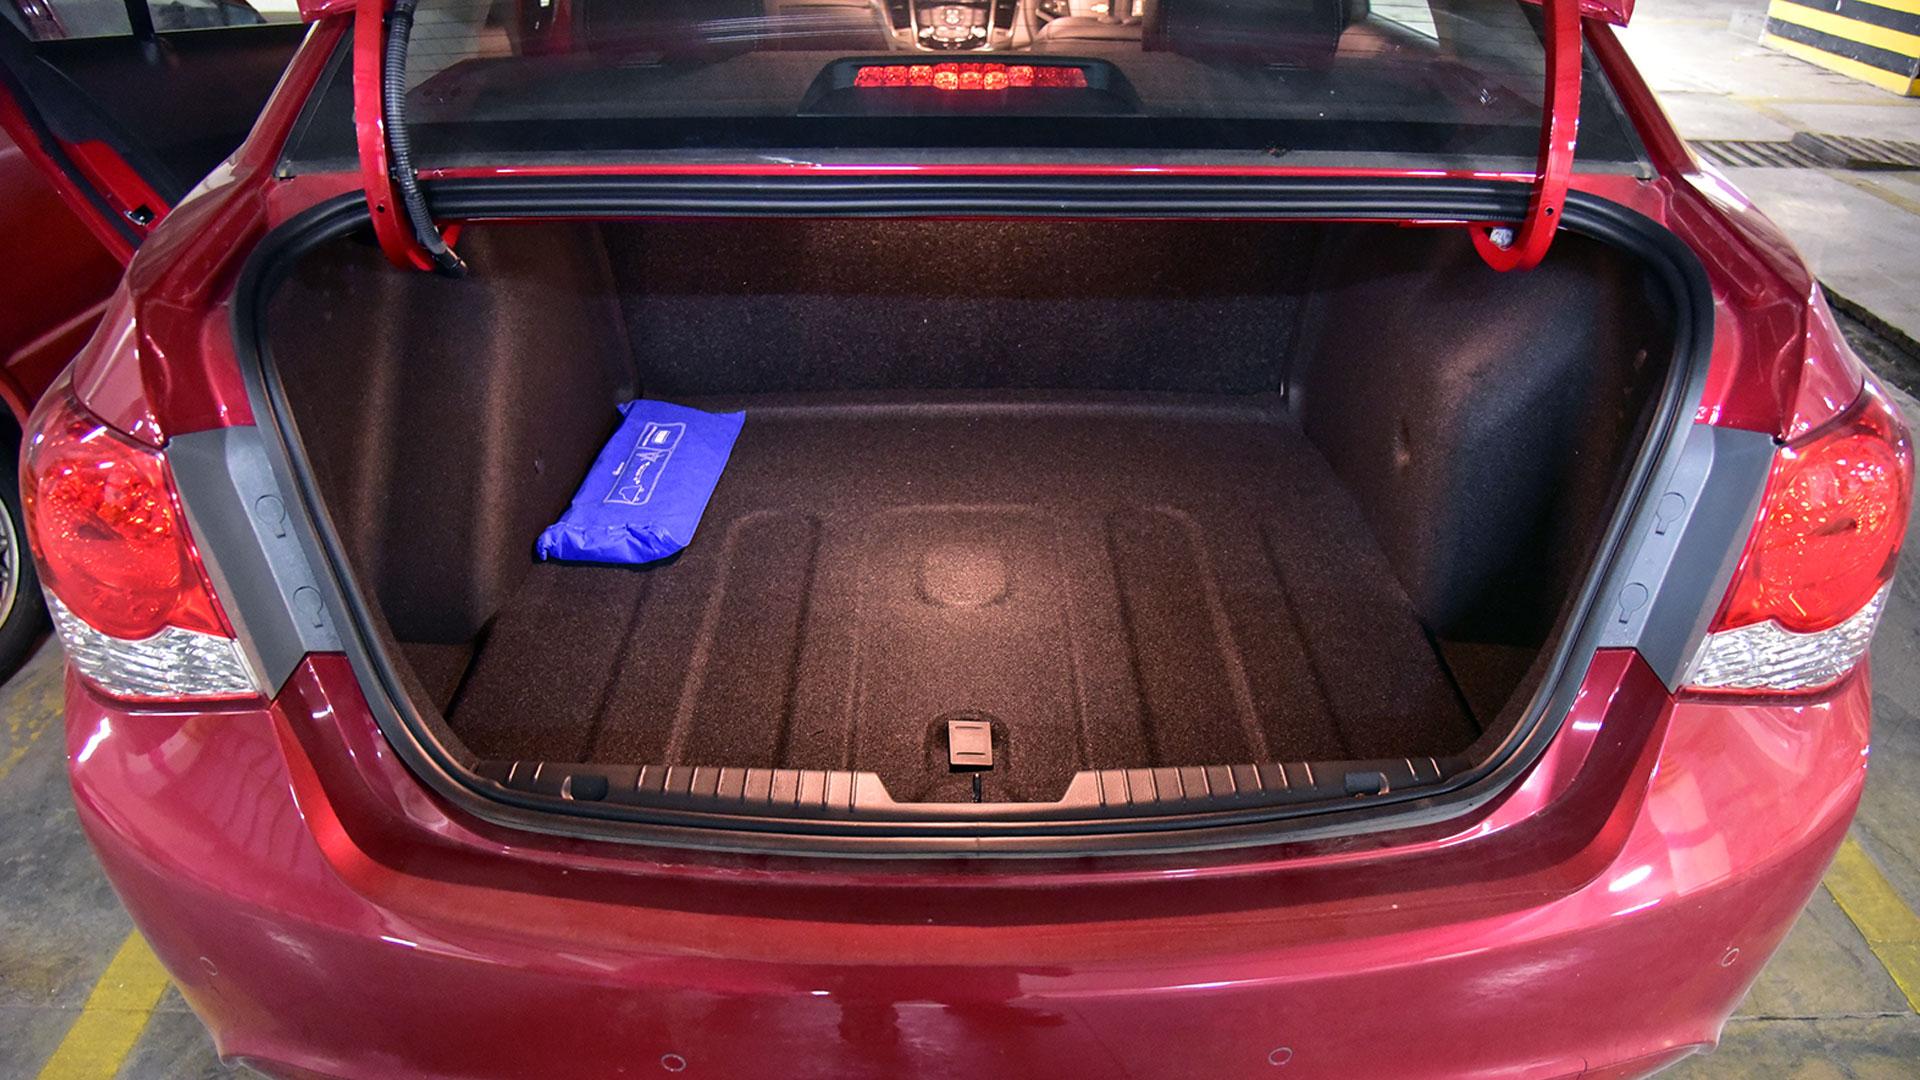 Chevrolet Cruze 2016 LTZ Compare